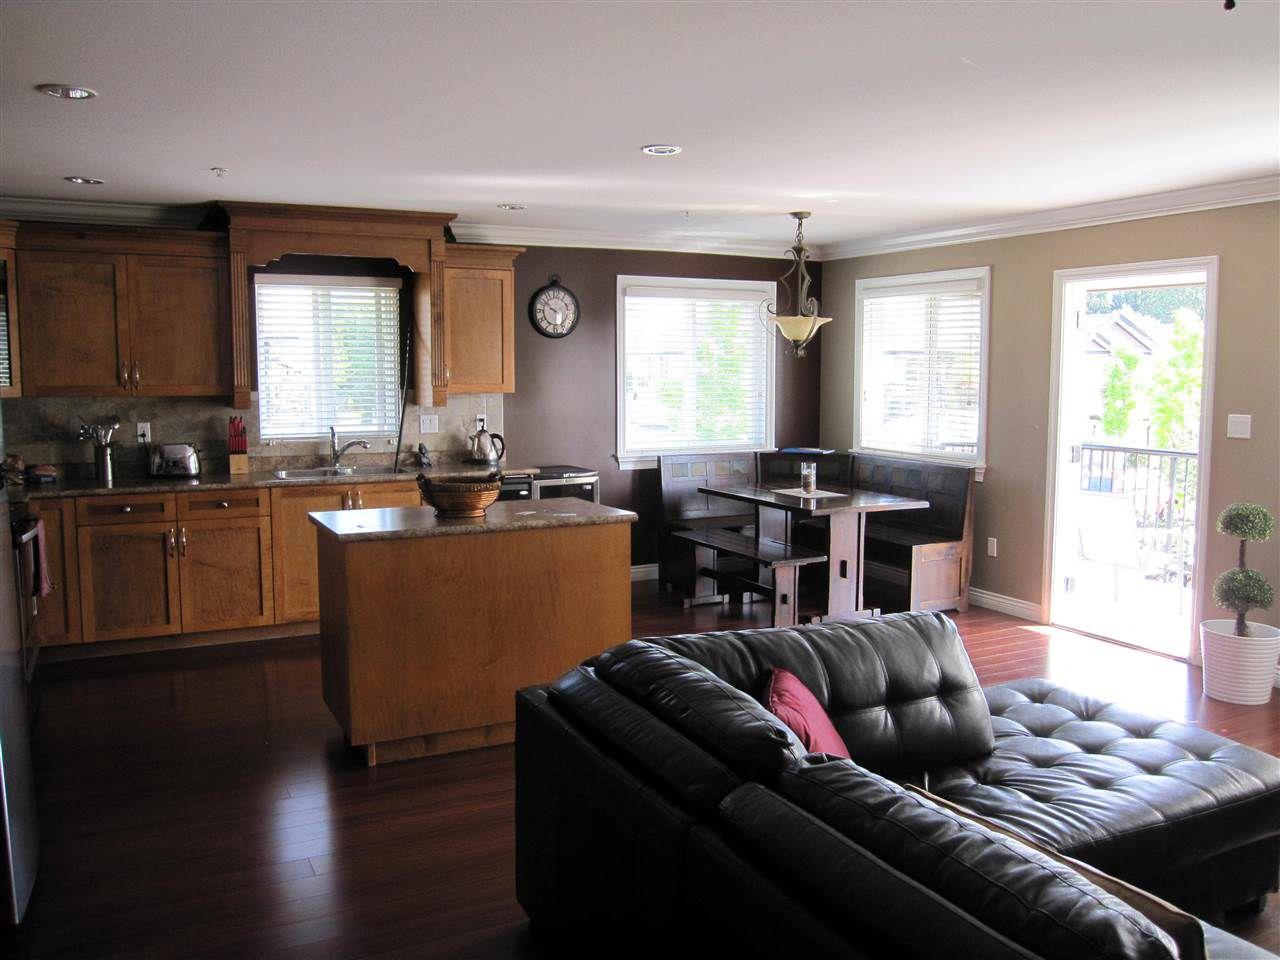 Photo 4: Photos: 11316 236 Street in Maple Ridge: Cottonwood MR House for sale : MLS®# R2062616